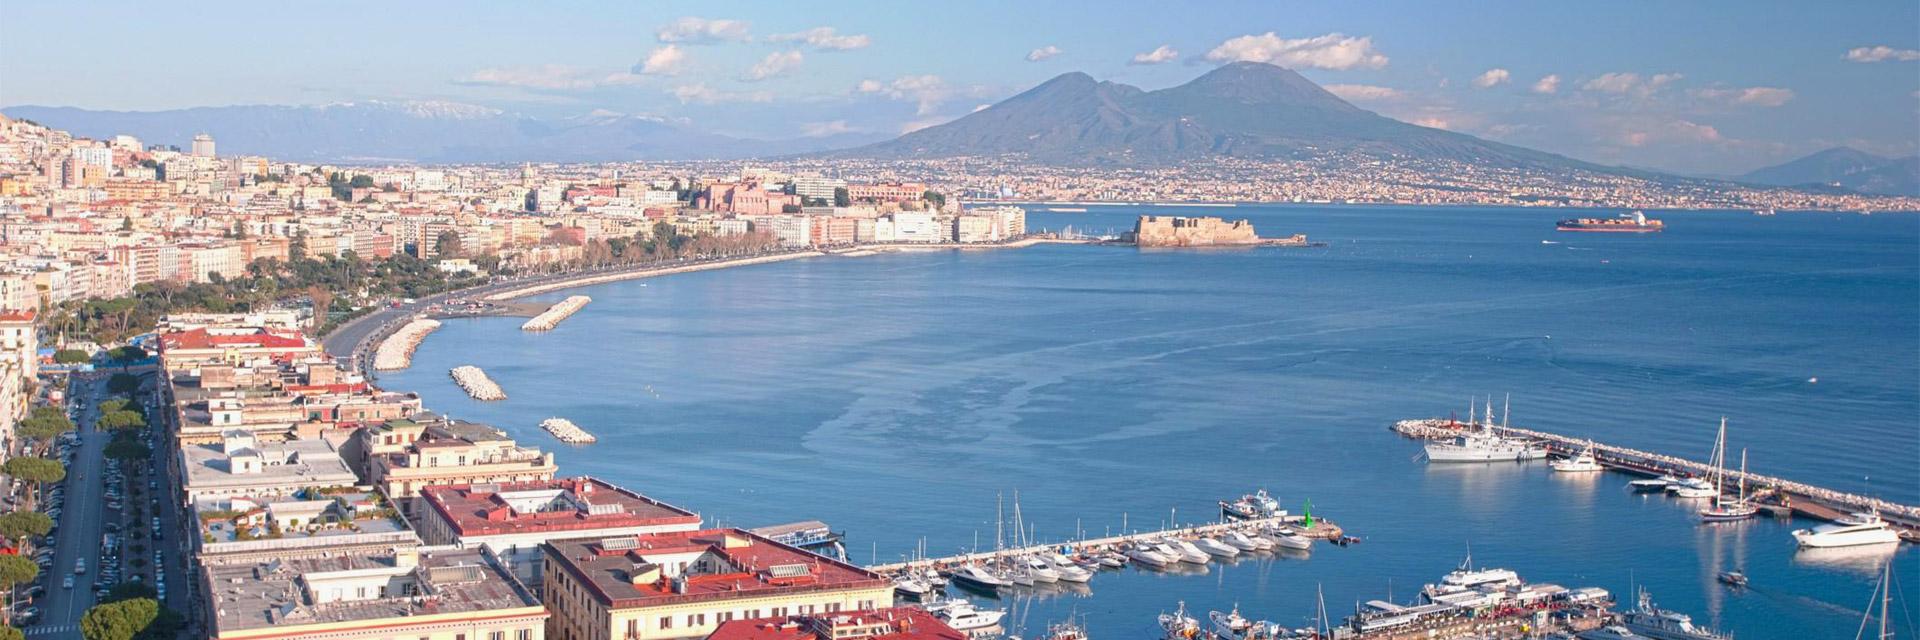 Naples the Gulf